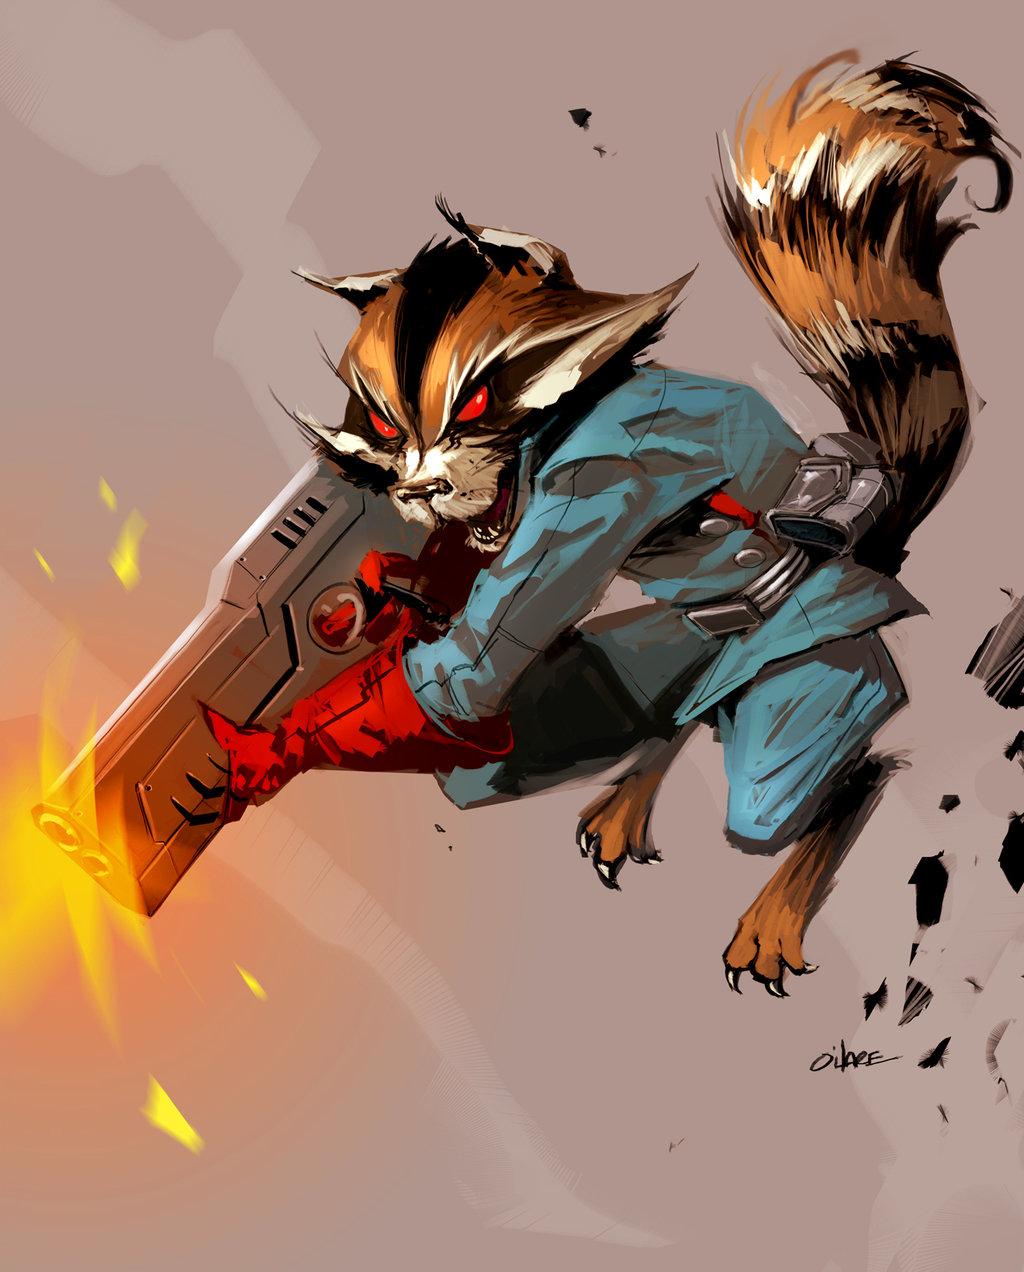 Drawn racoon comic Rocket Raccoon Wolverine Provided Vine